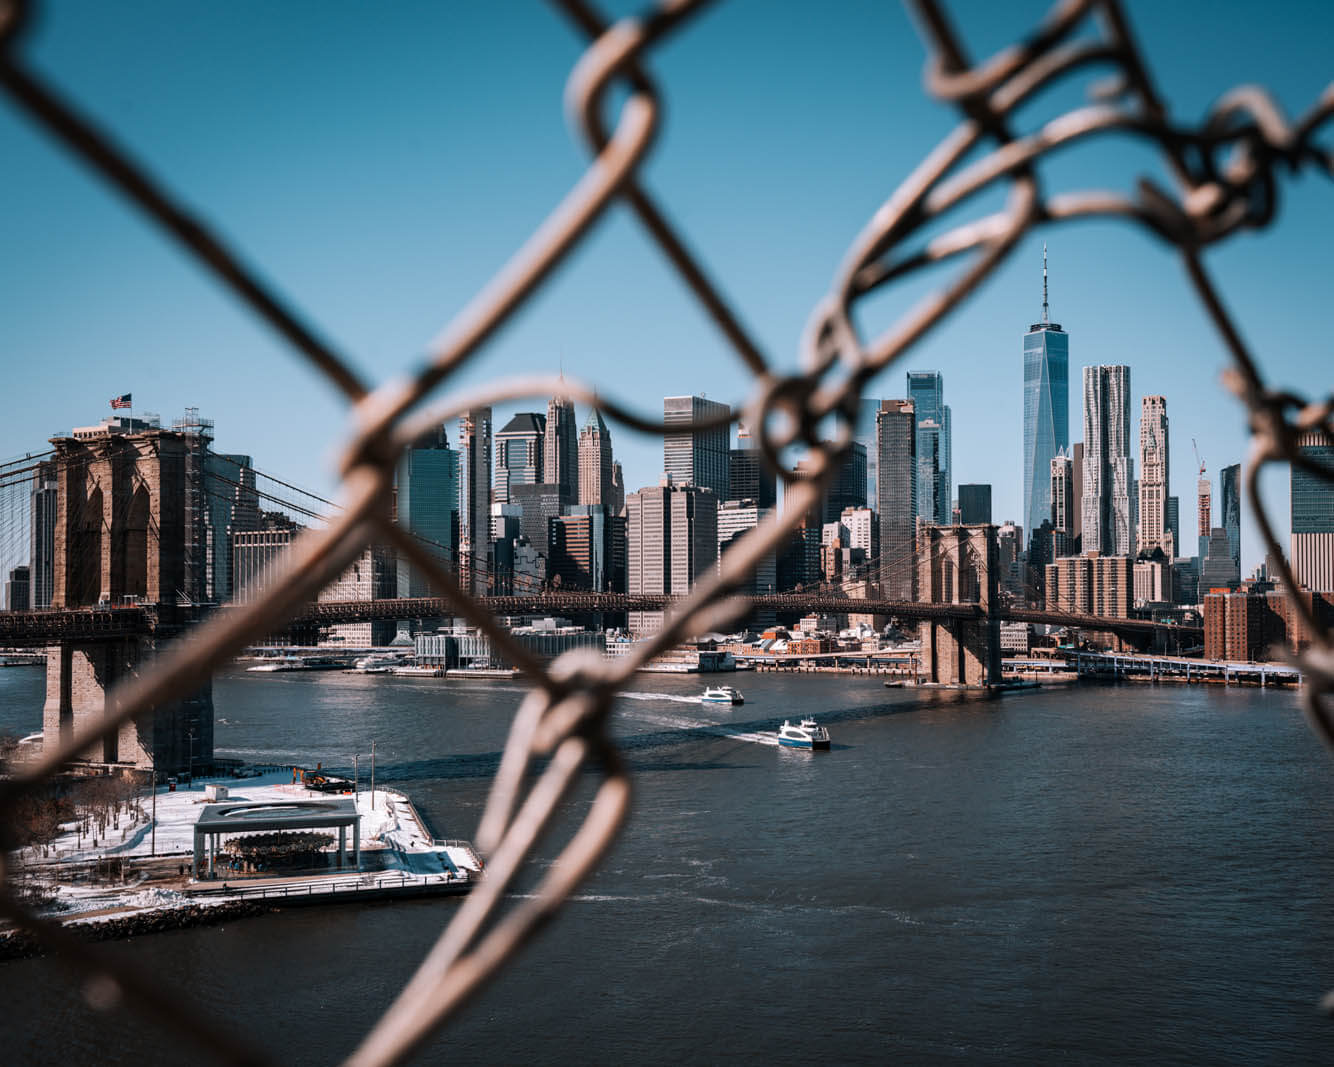 view from the Manhattan Bridge walk in NYC